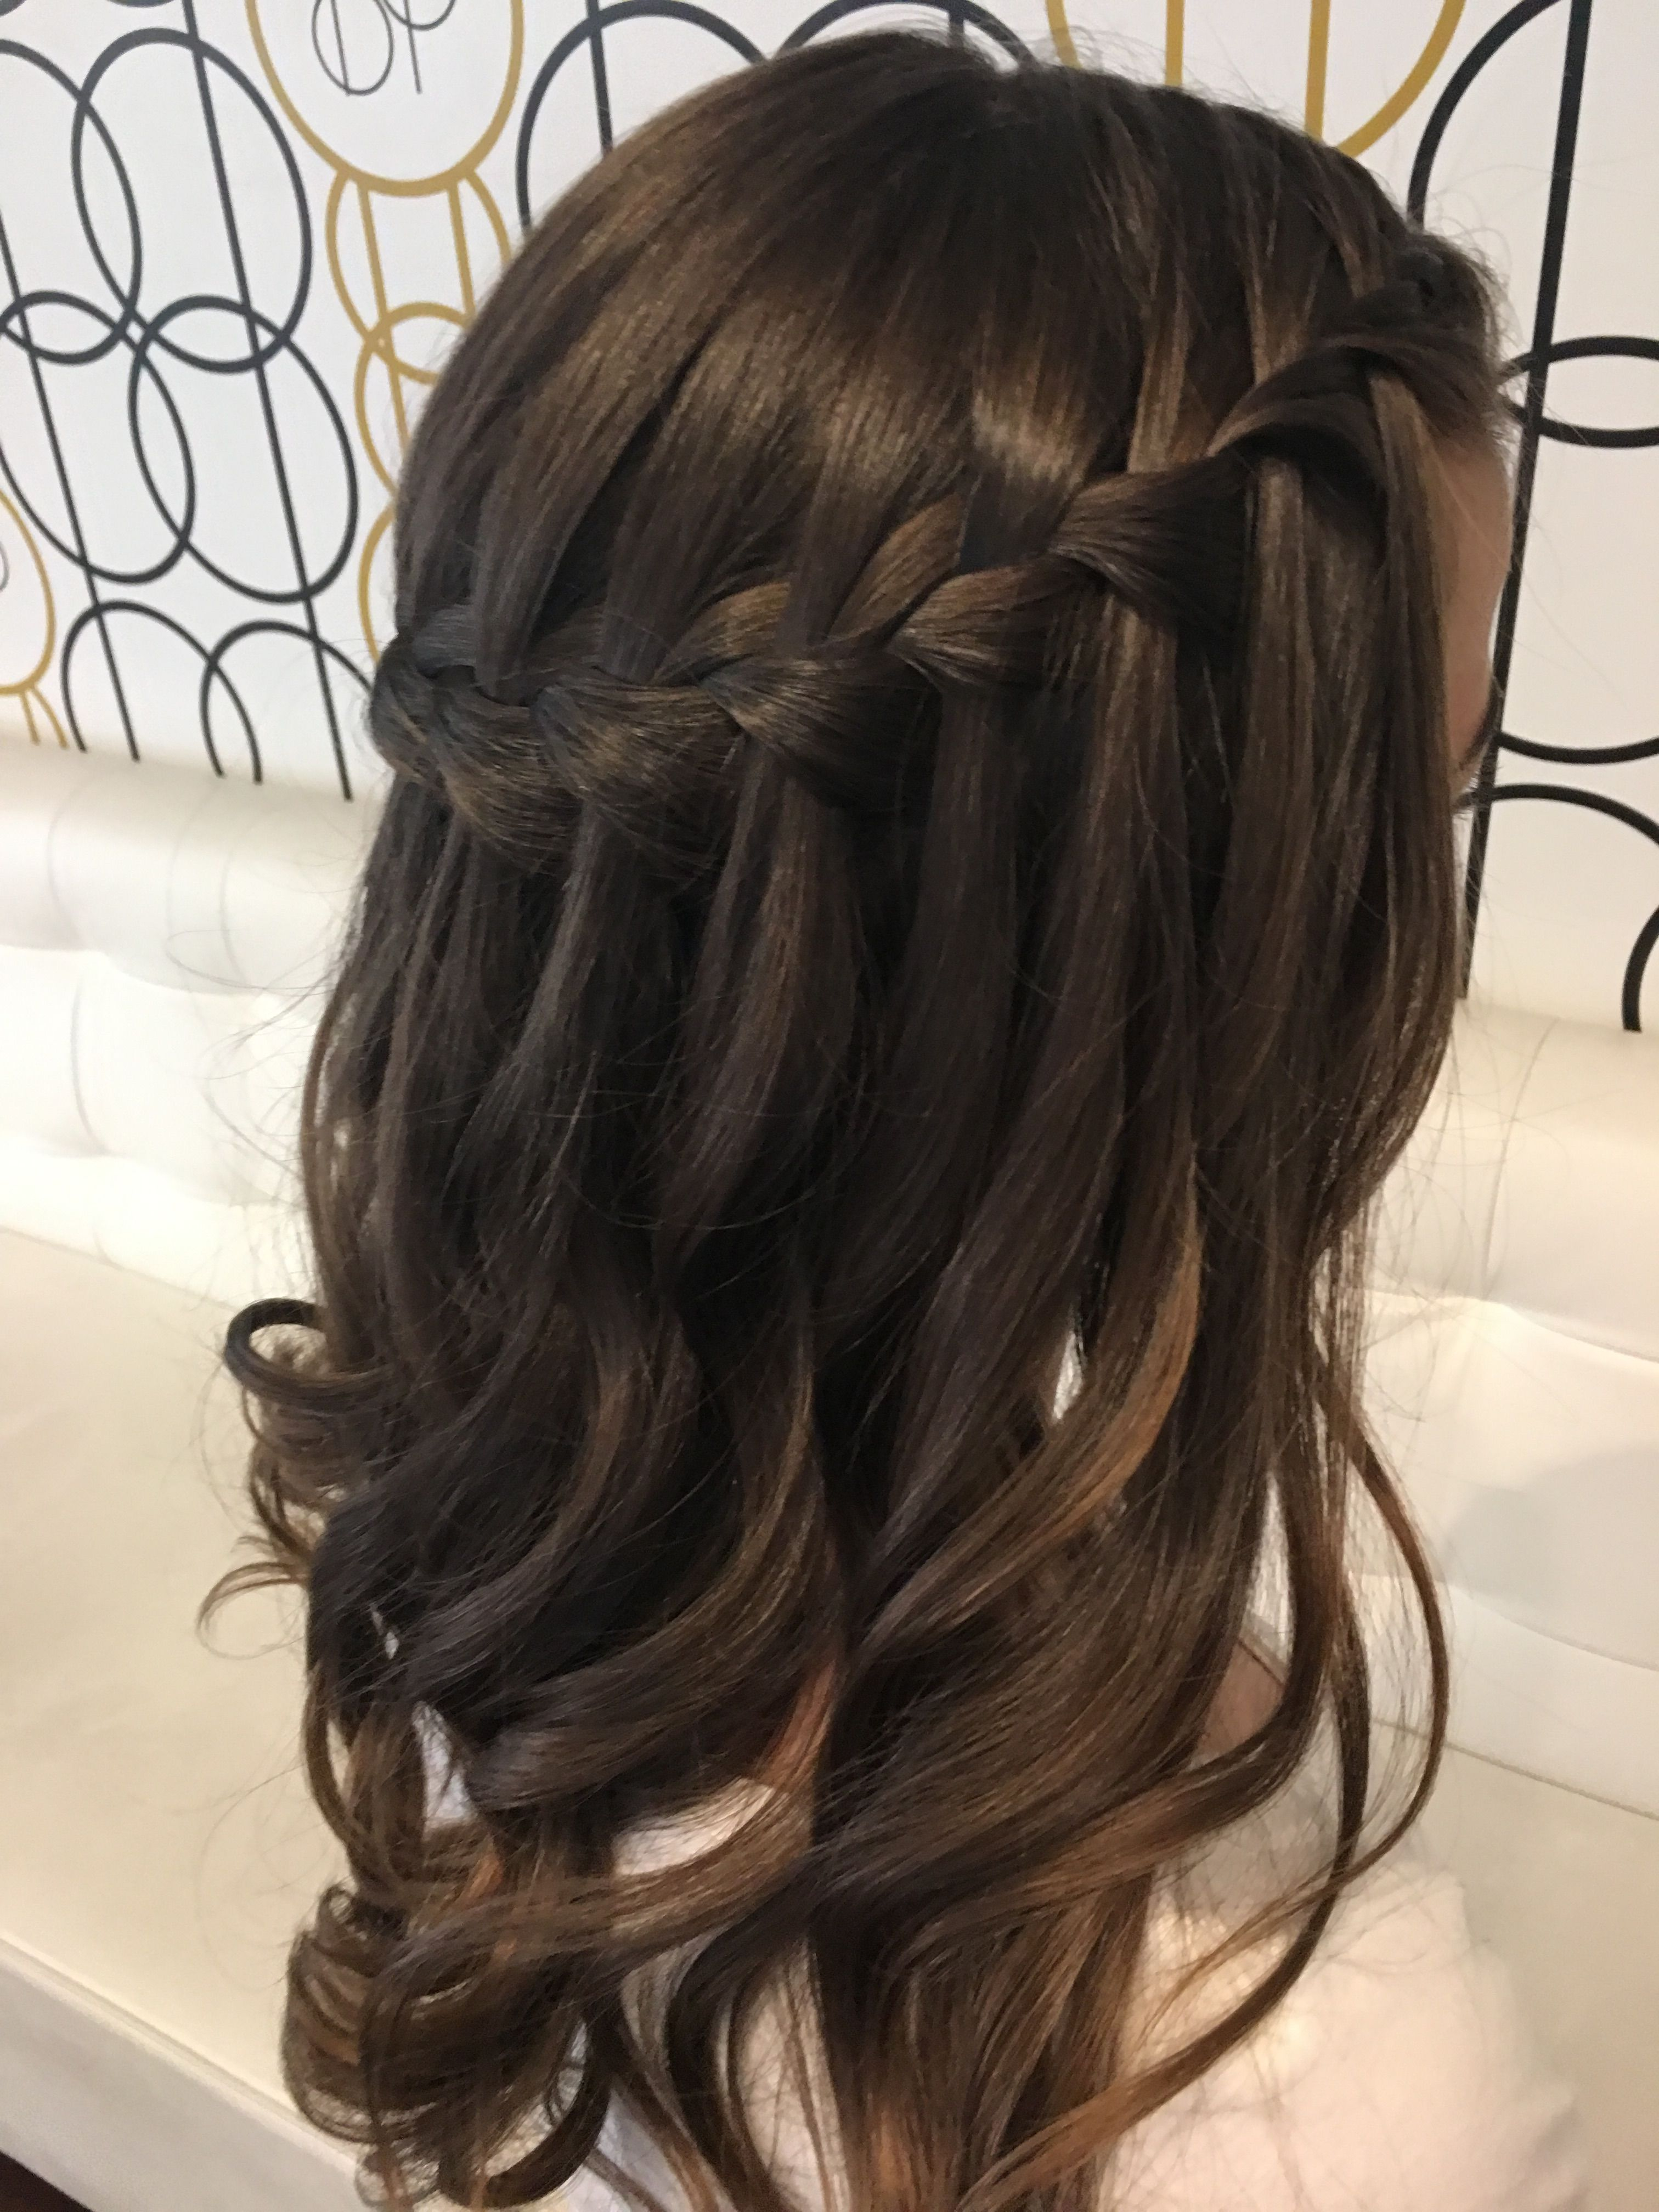 Waterfall braid with loose curls